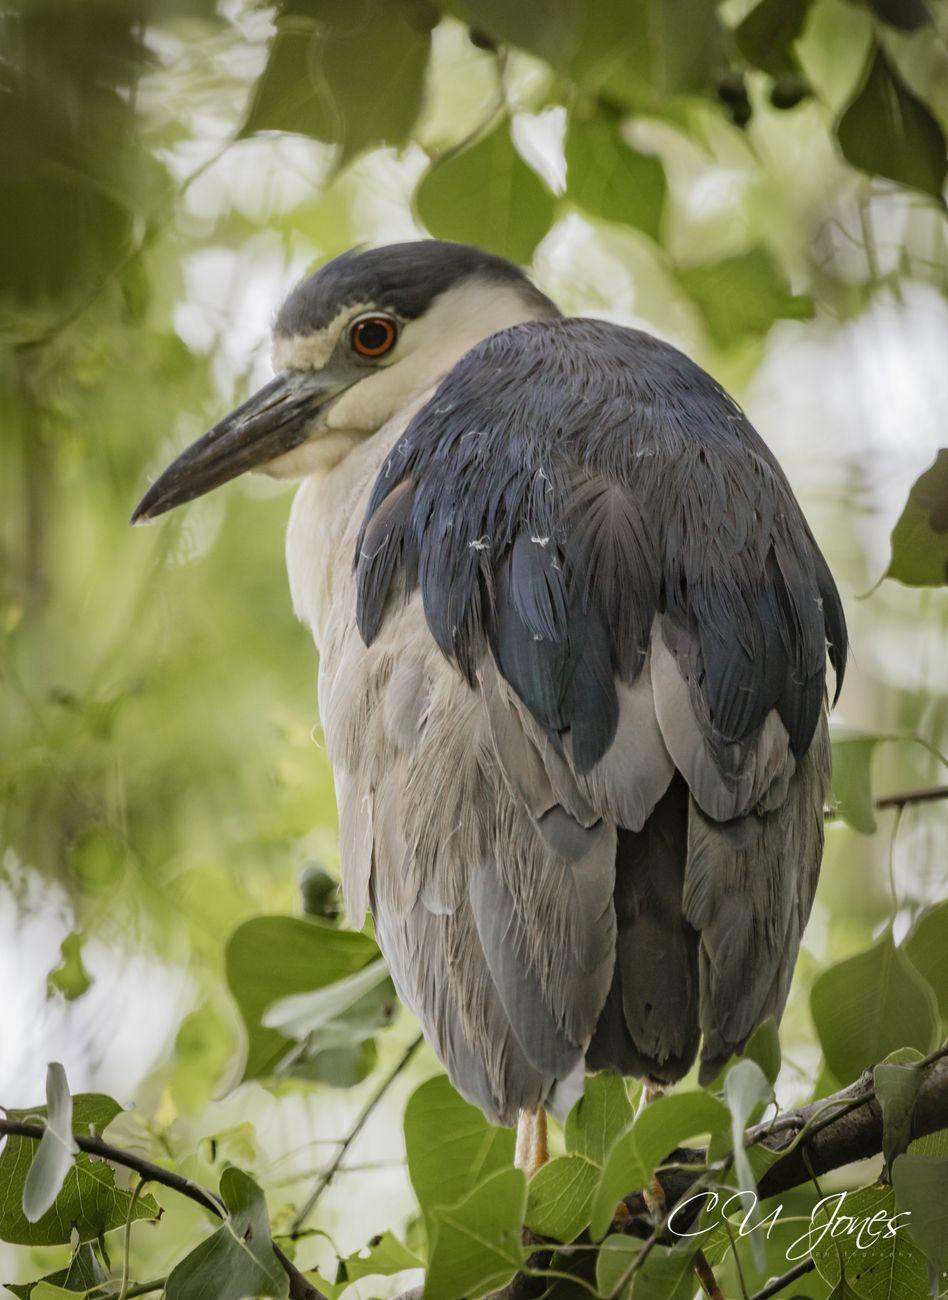 heron at Cypress Wetlands in Port Royal, SC